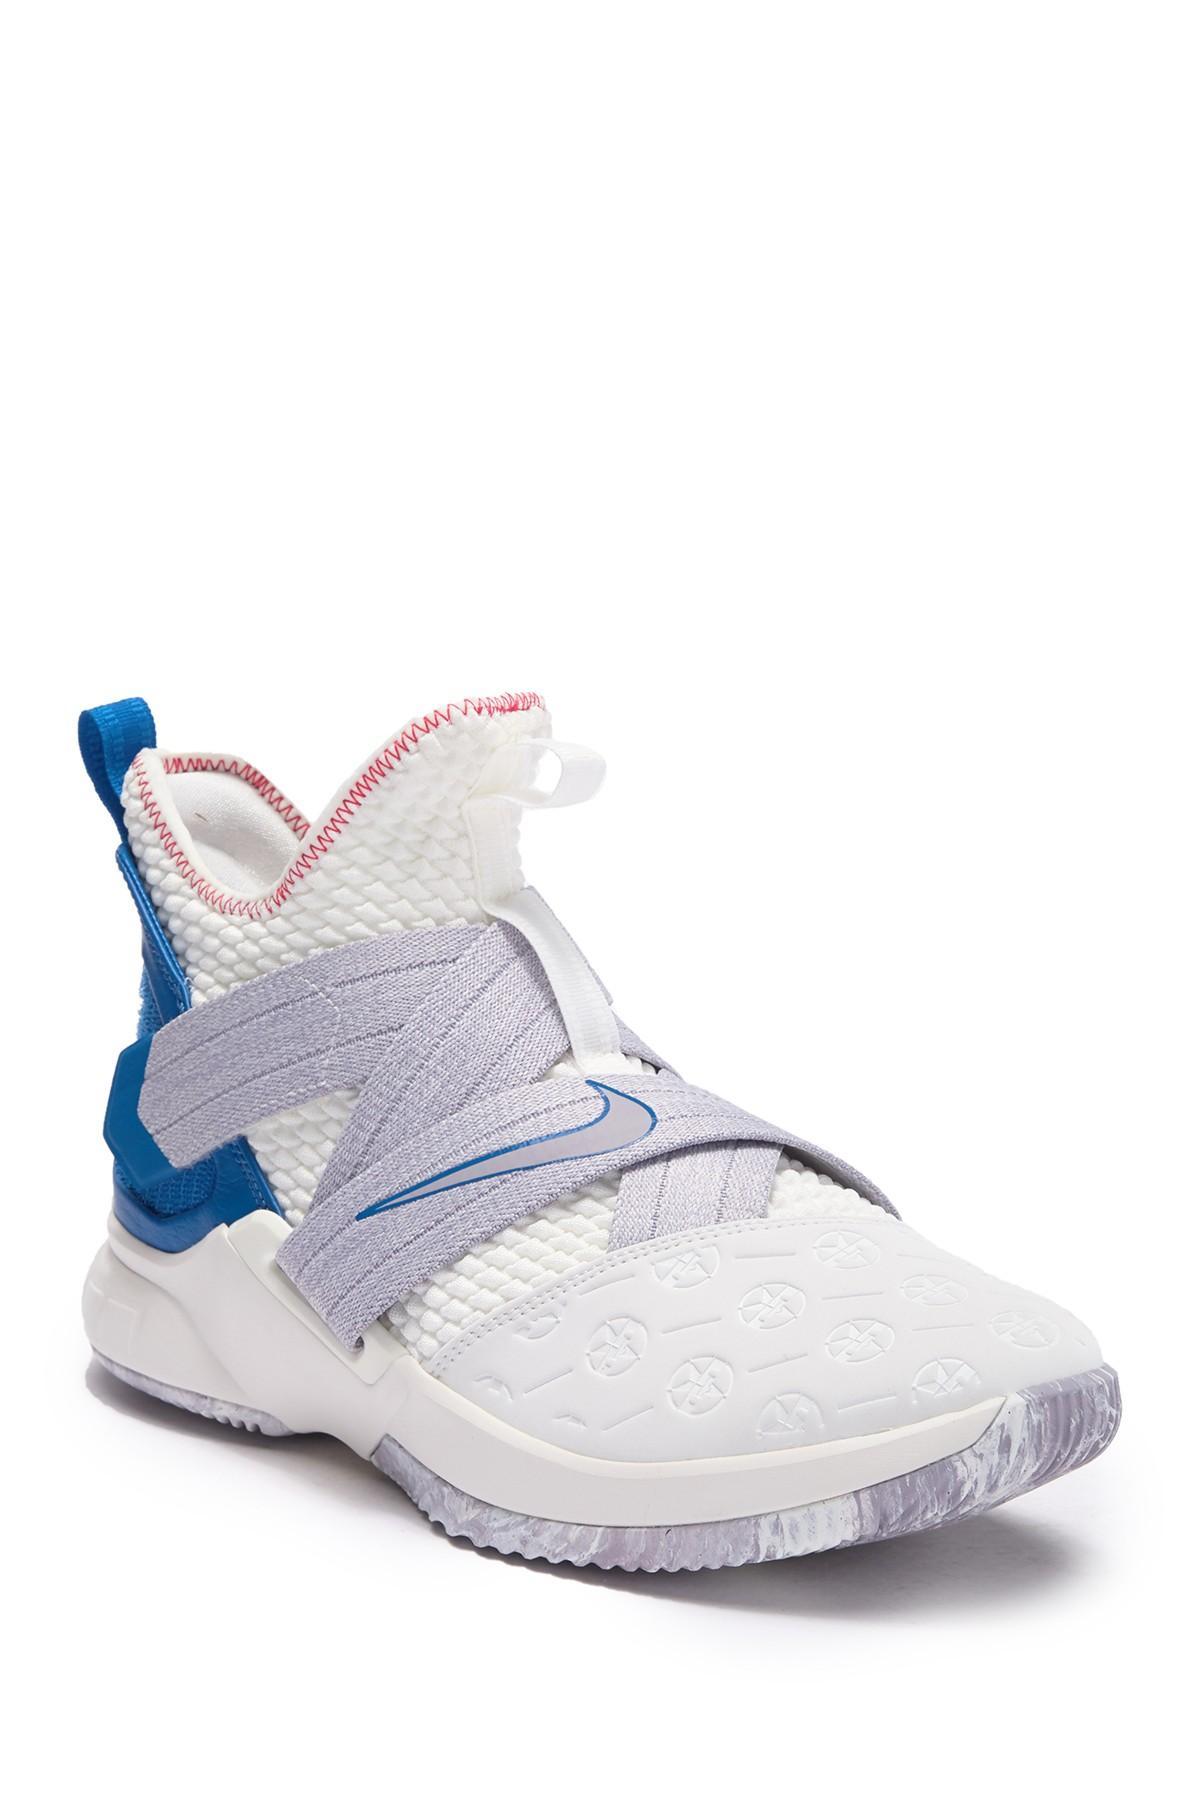 22a942b6e1e0 Lyst - Nike Lebron Soldier Xii Sneaker in White for Men